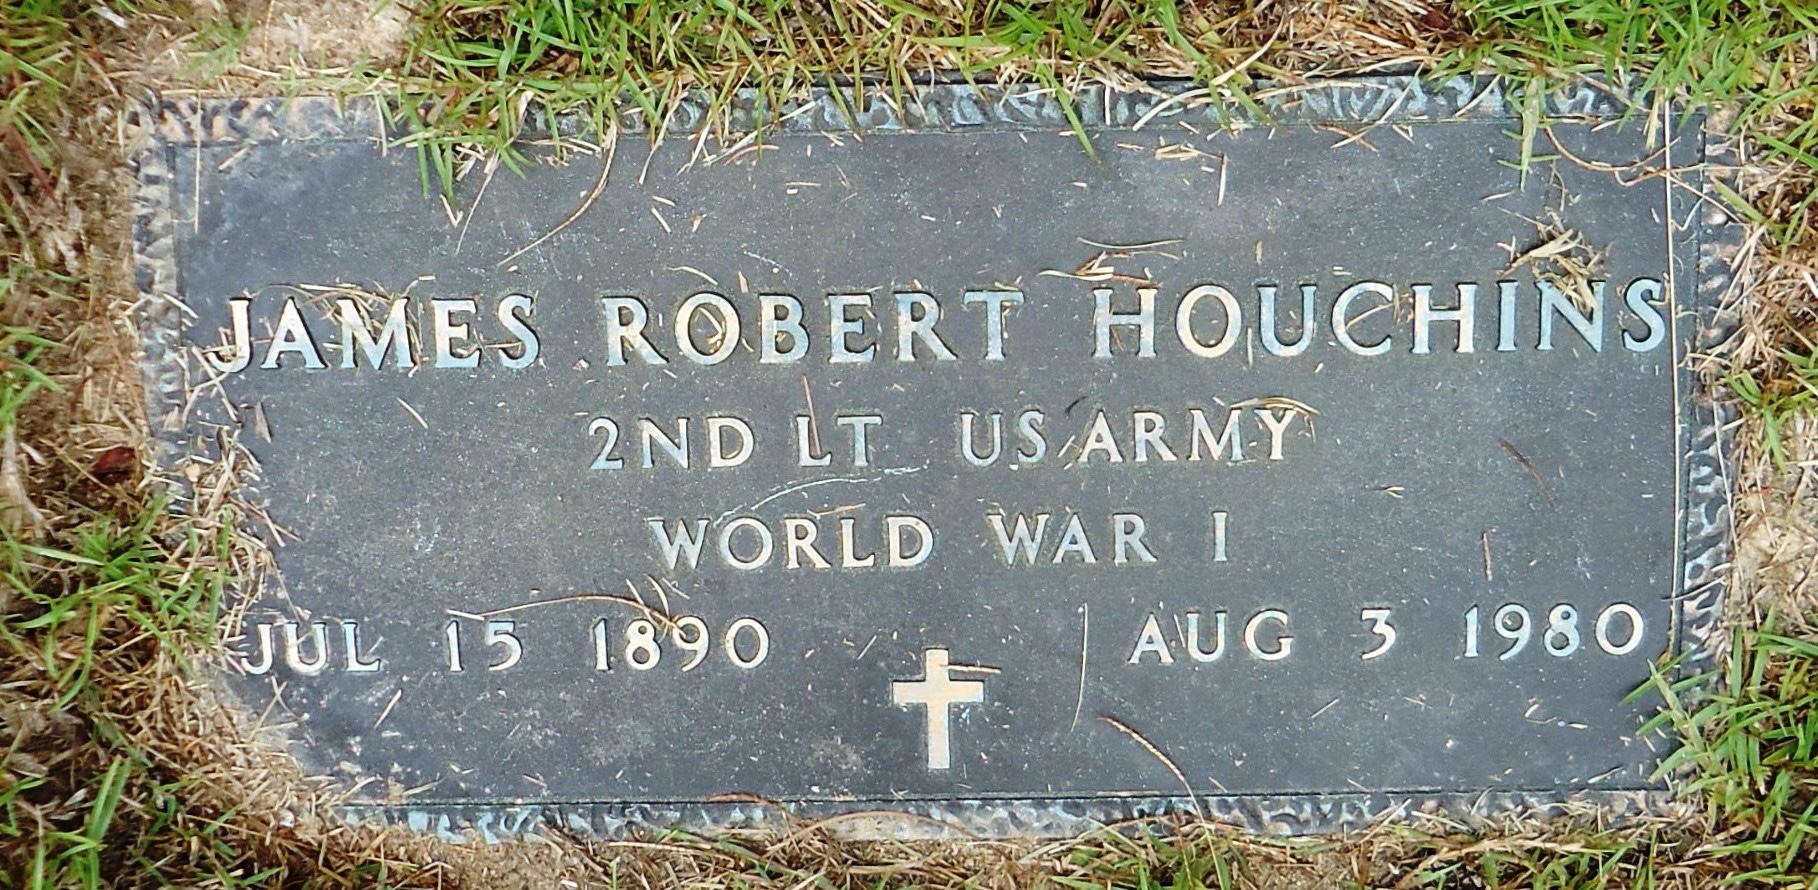 James Robert Houchins